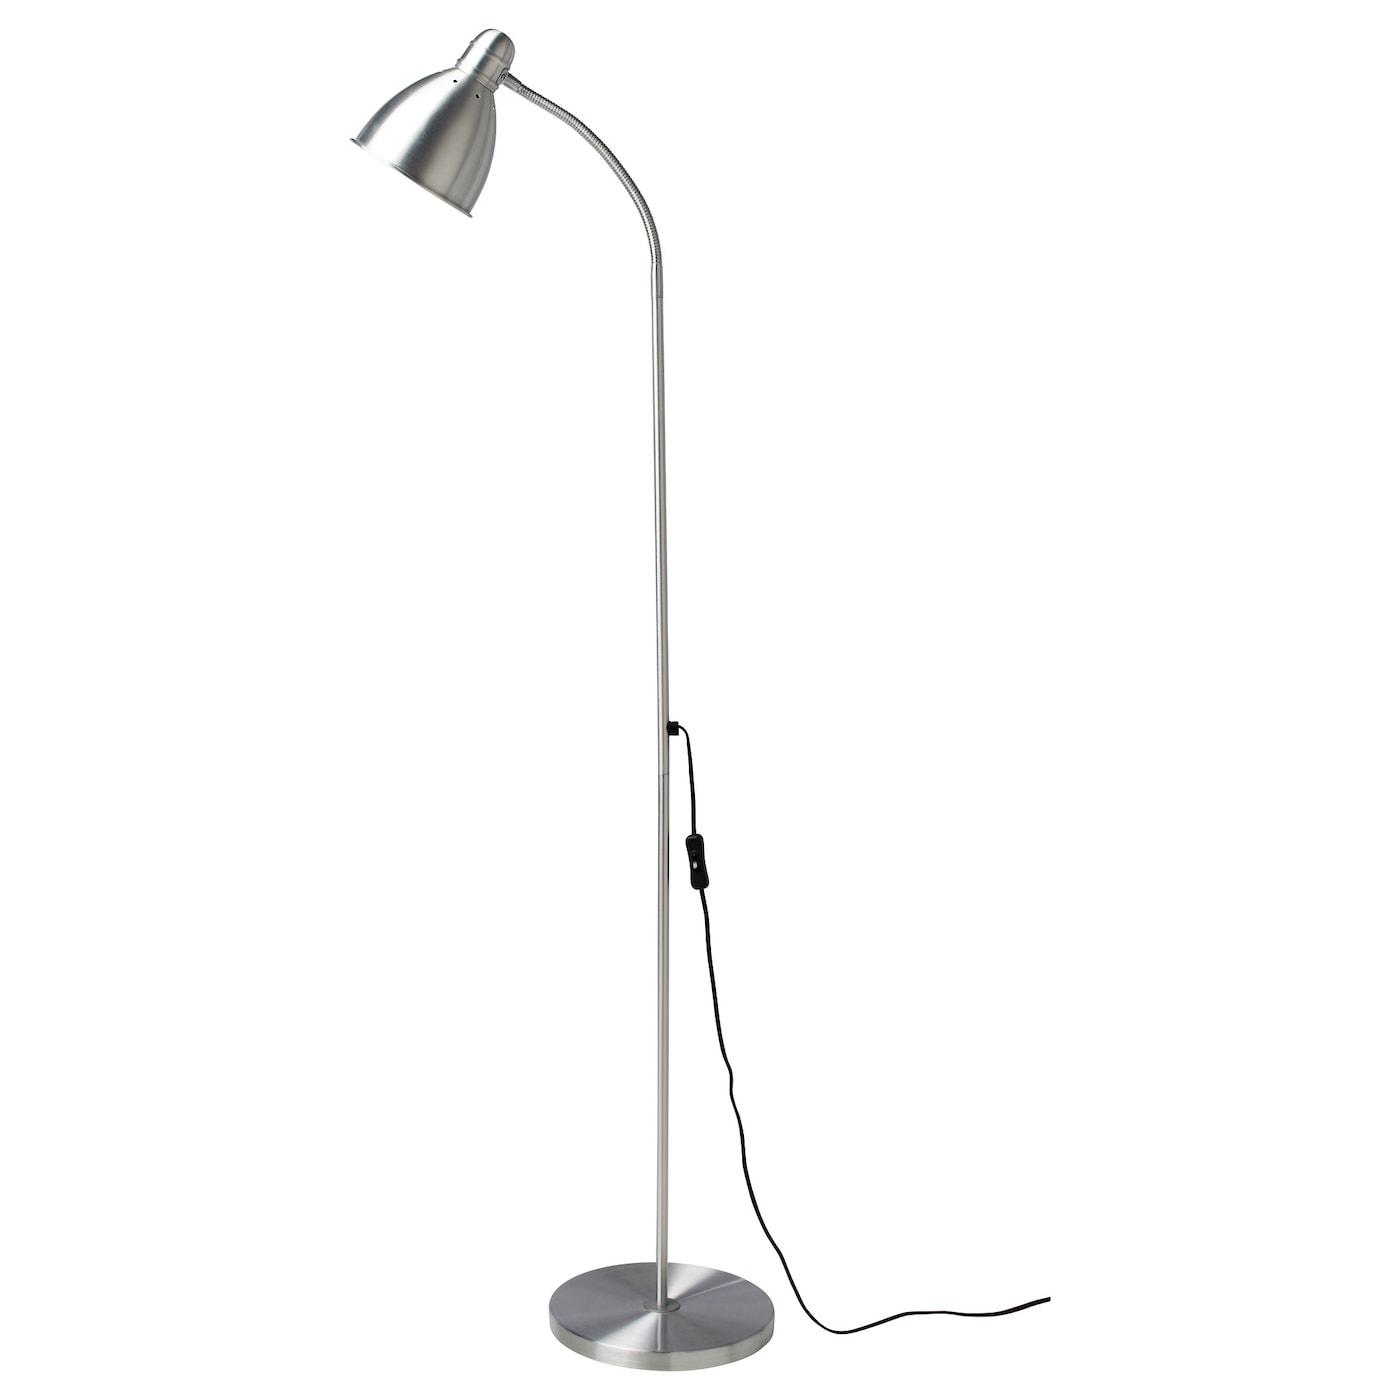 led lighting lights at ikea ireland dublin. Black Bedroom Furniture Sets. Home Design Ideas